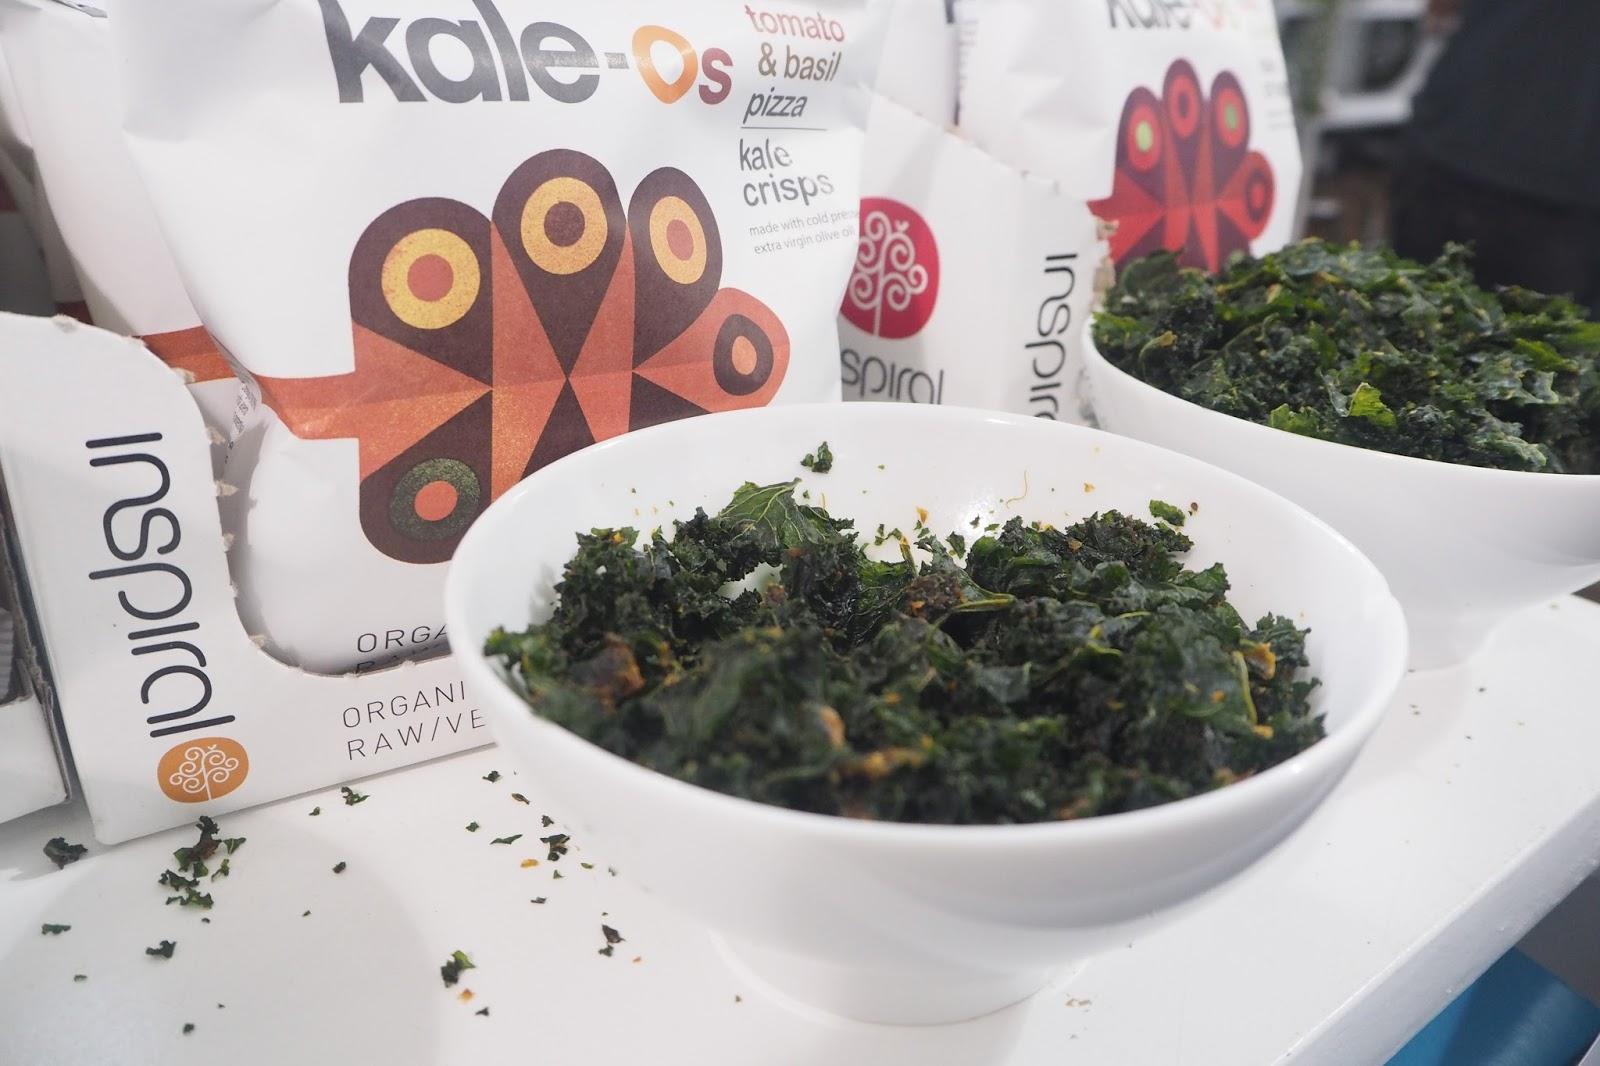 kale-chips-review-vegan-copper-garden